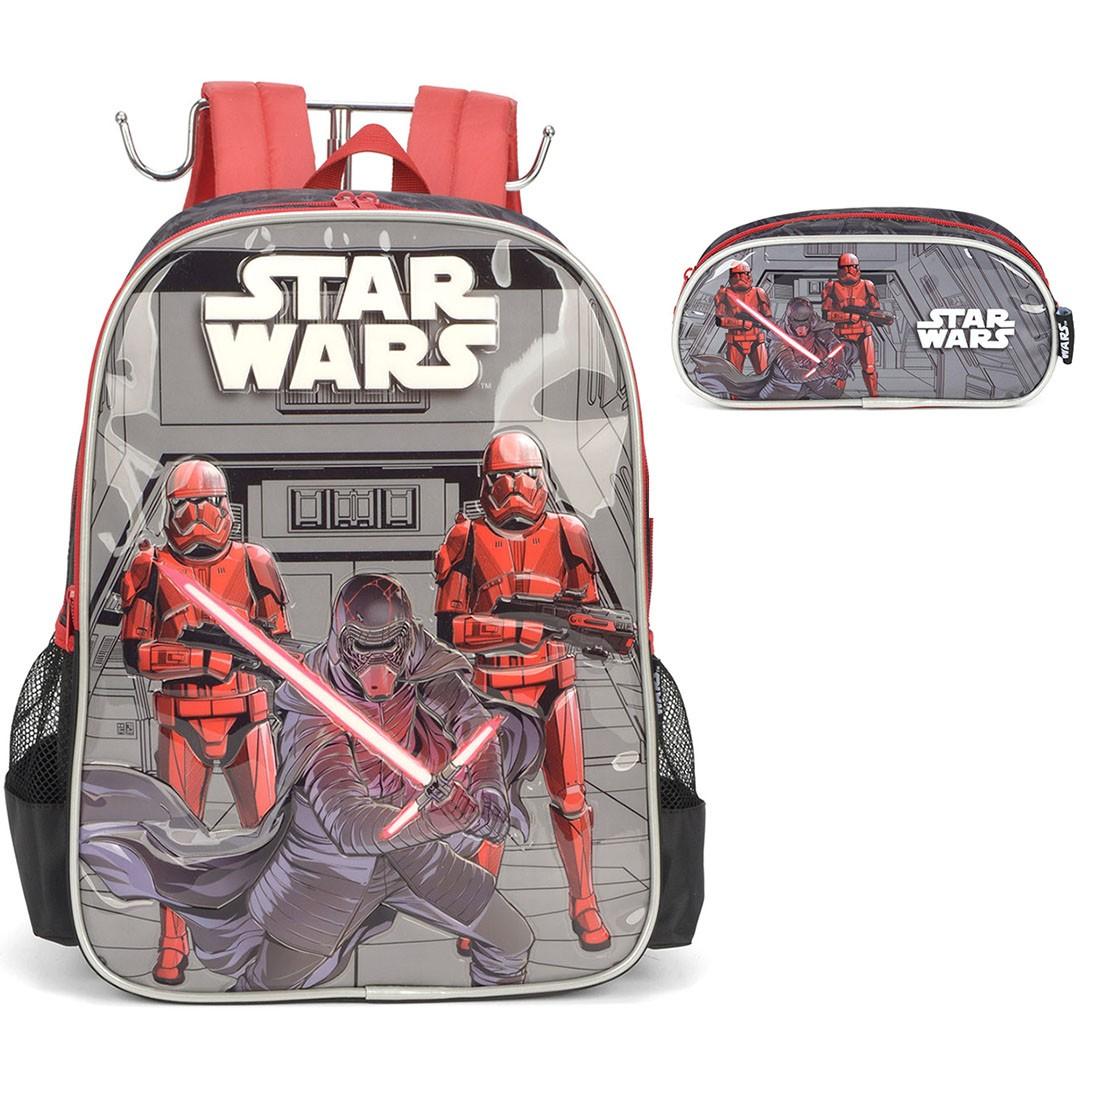 Mochila Infantil Star Wars com Estojo Cinza